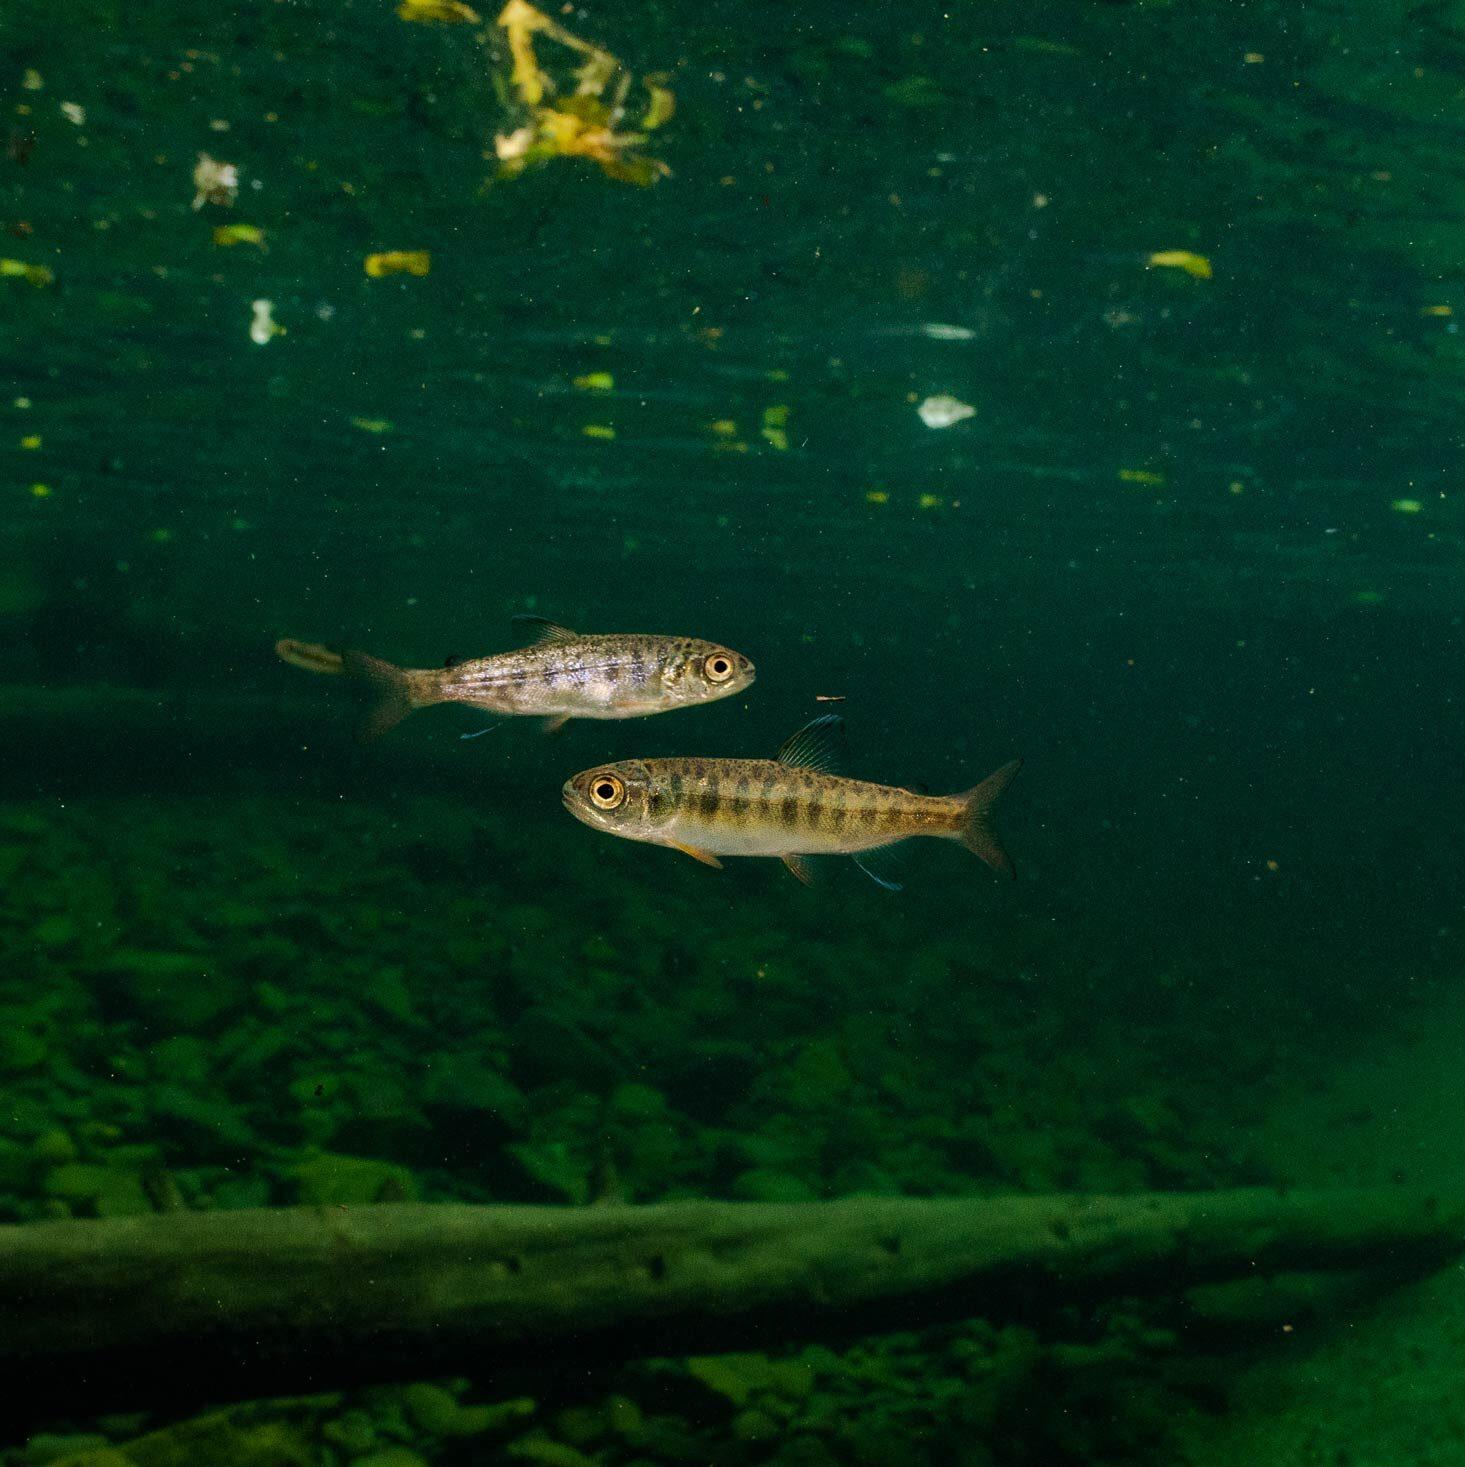 Two tiny fish float int he dark green sea.